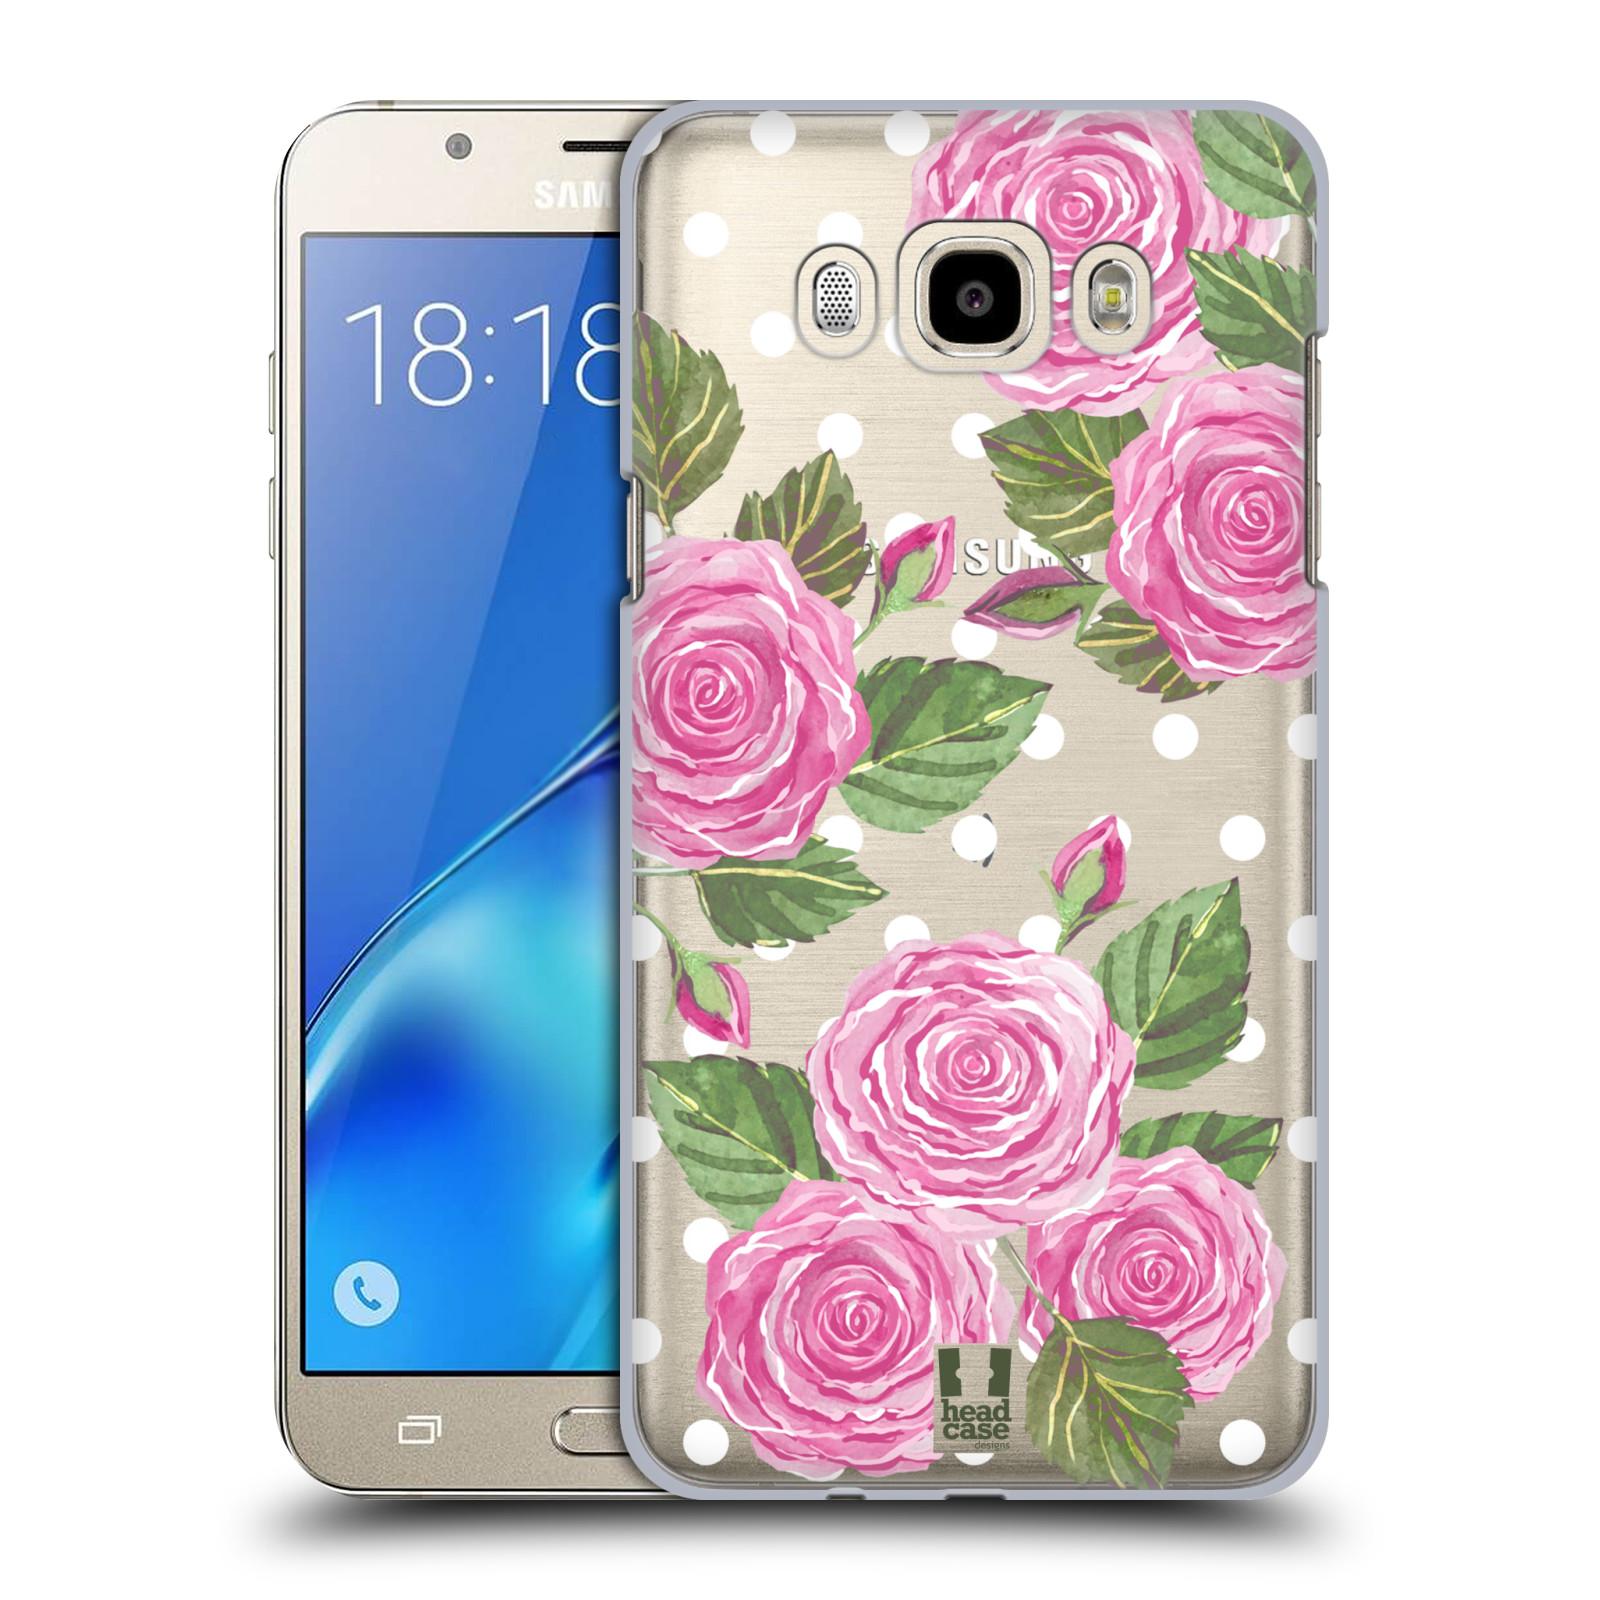 Plastové pouzdro na mobil Samsung Galaxy J7 (2016) - Head Case - Hezoučké růžičky - průhledné